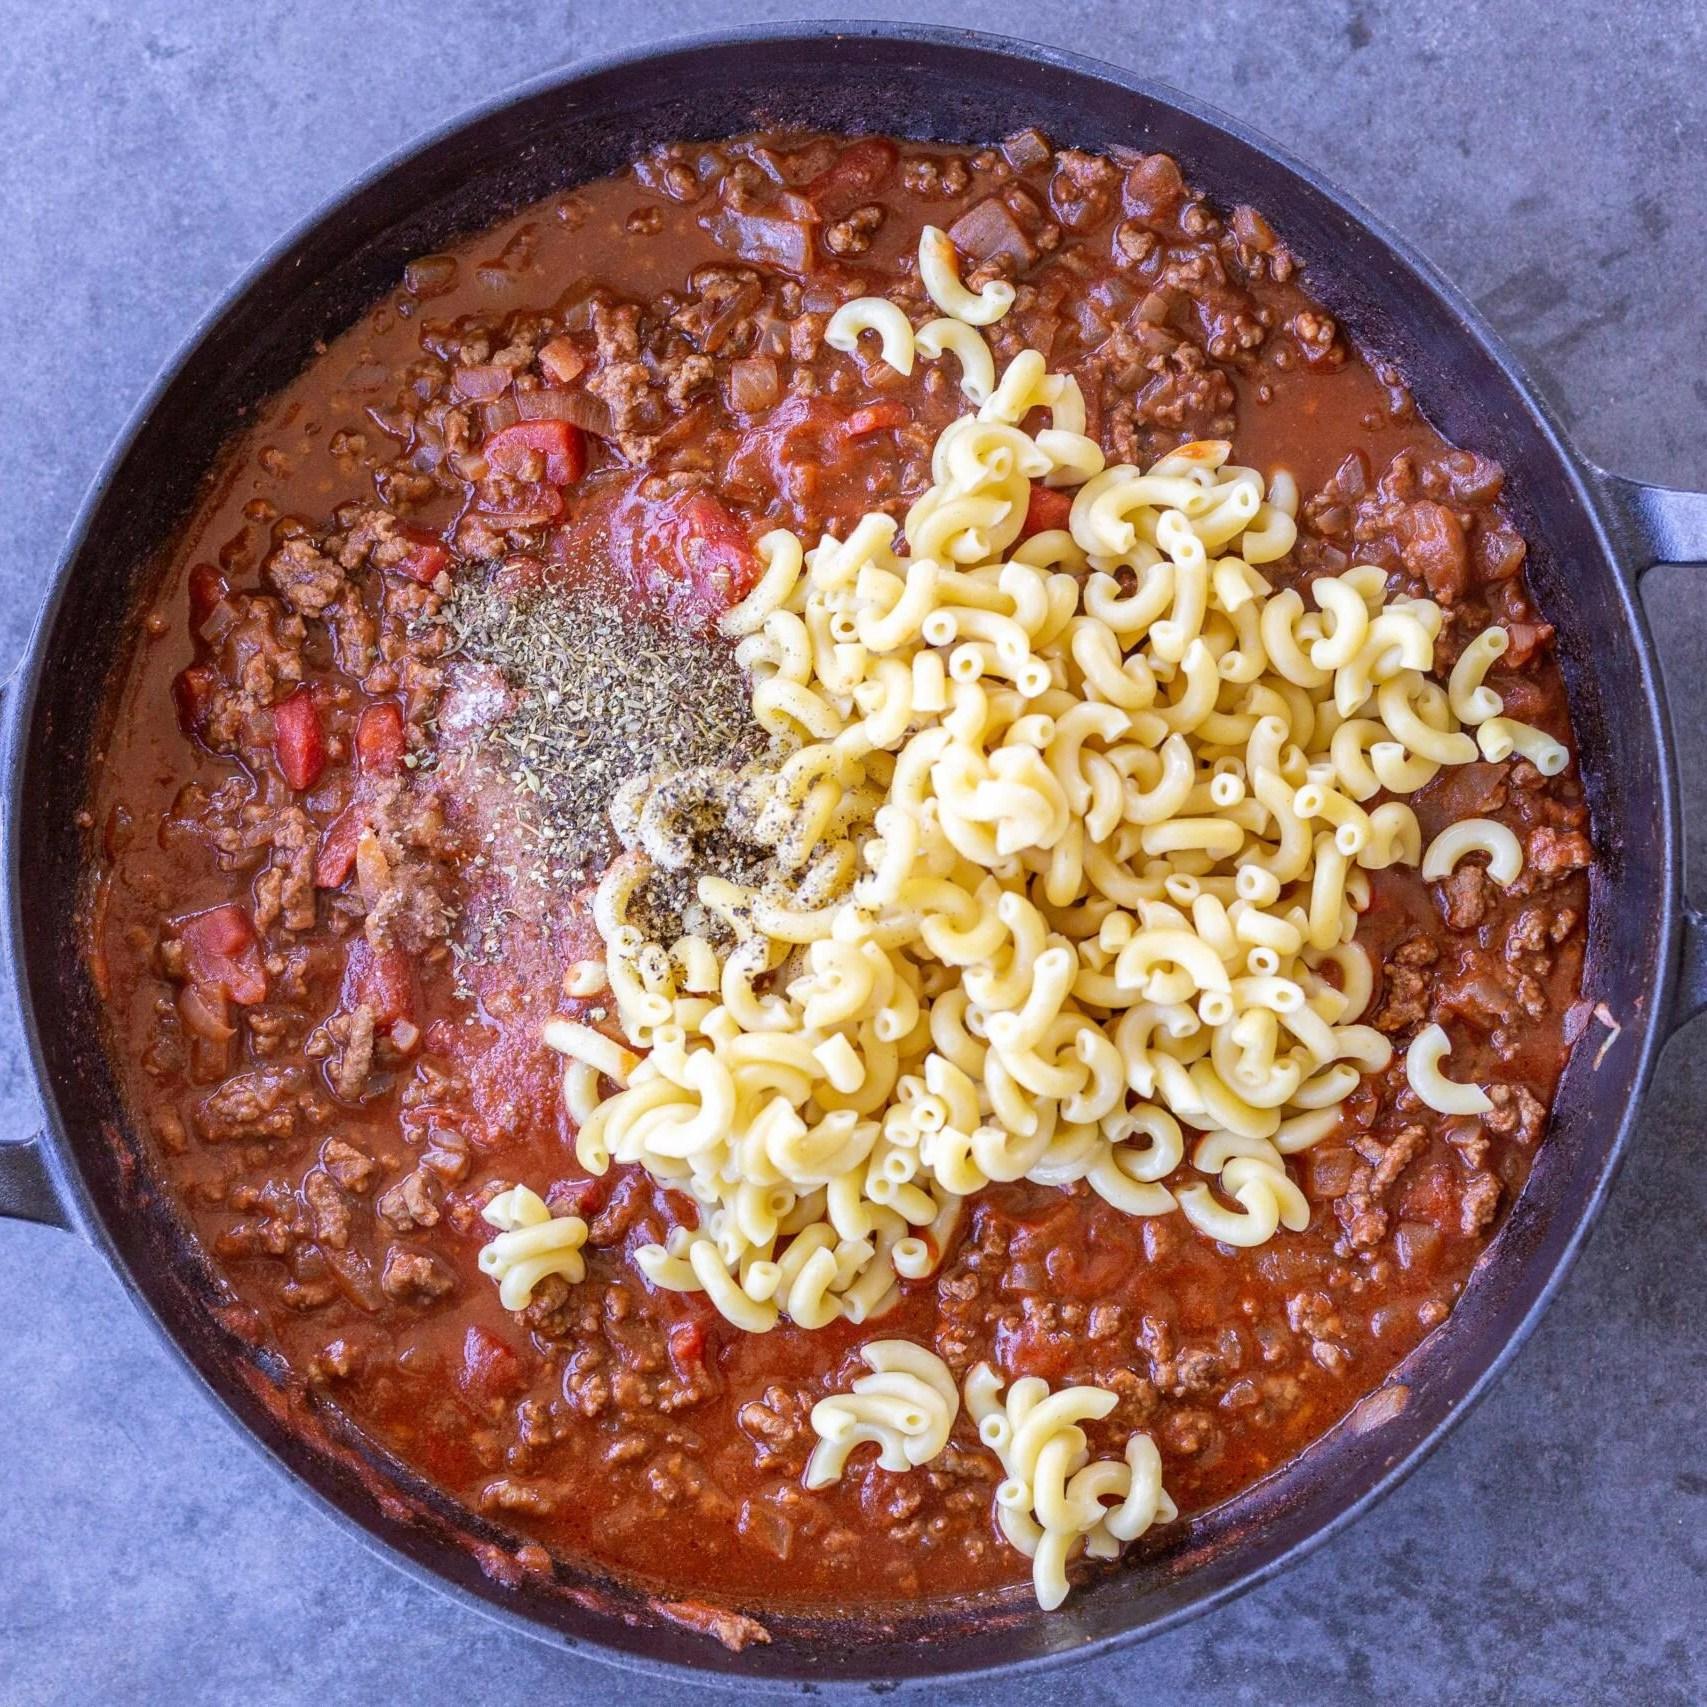 Macaroni added to a pan